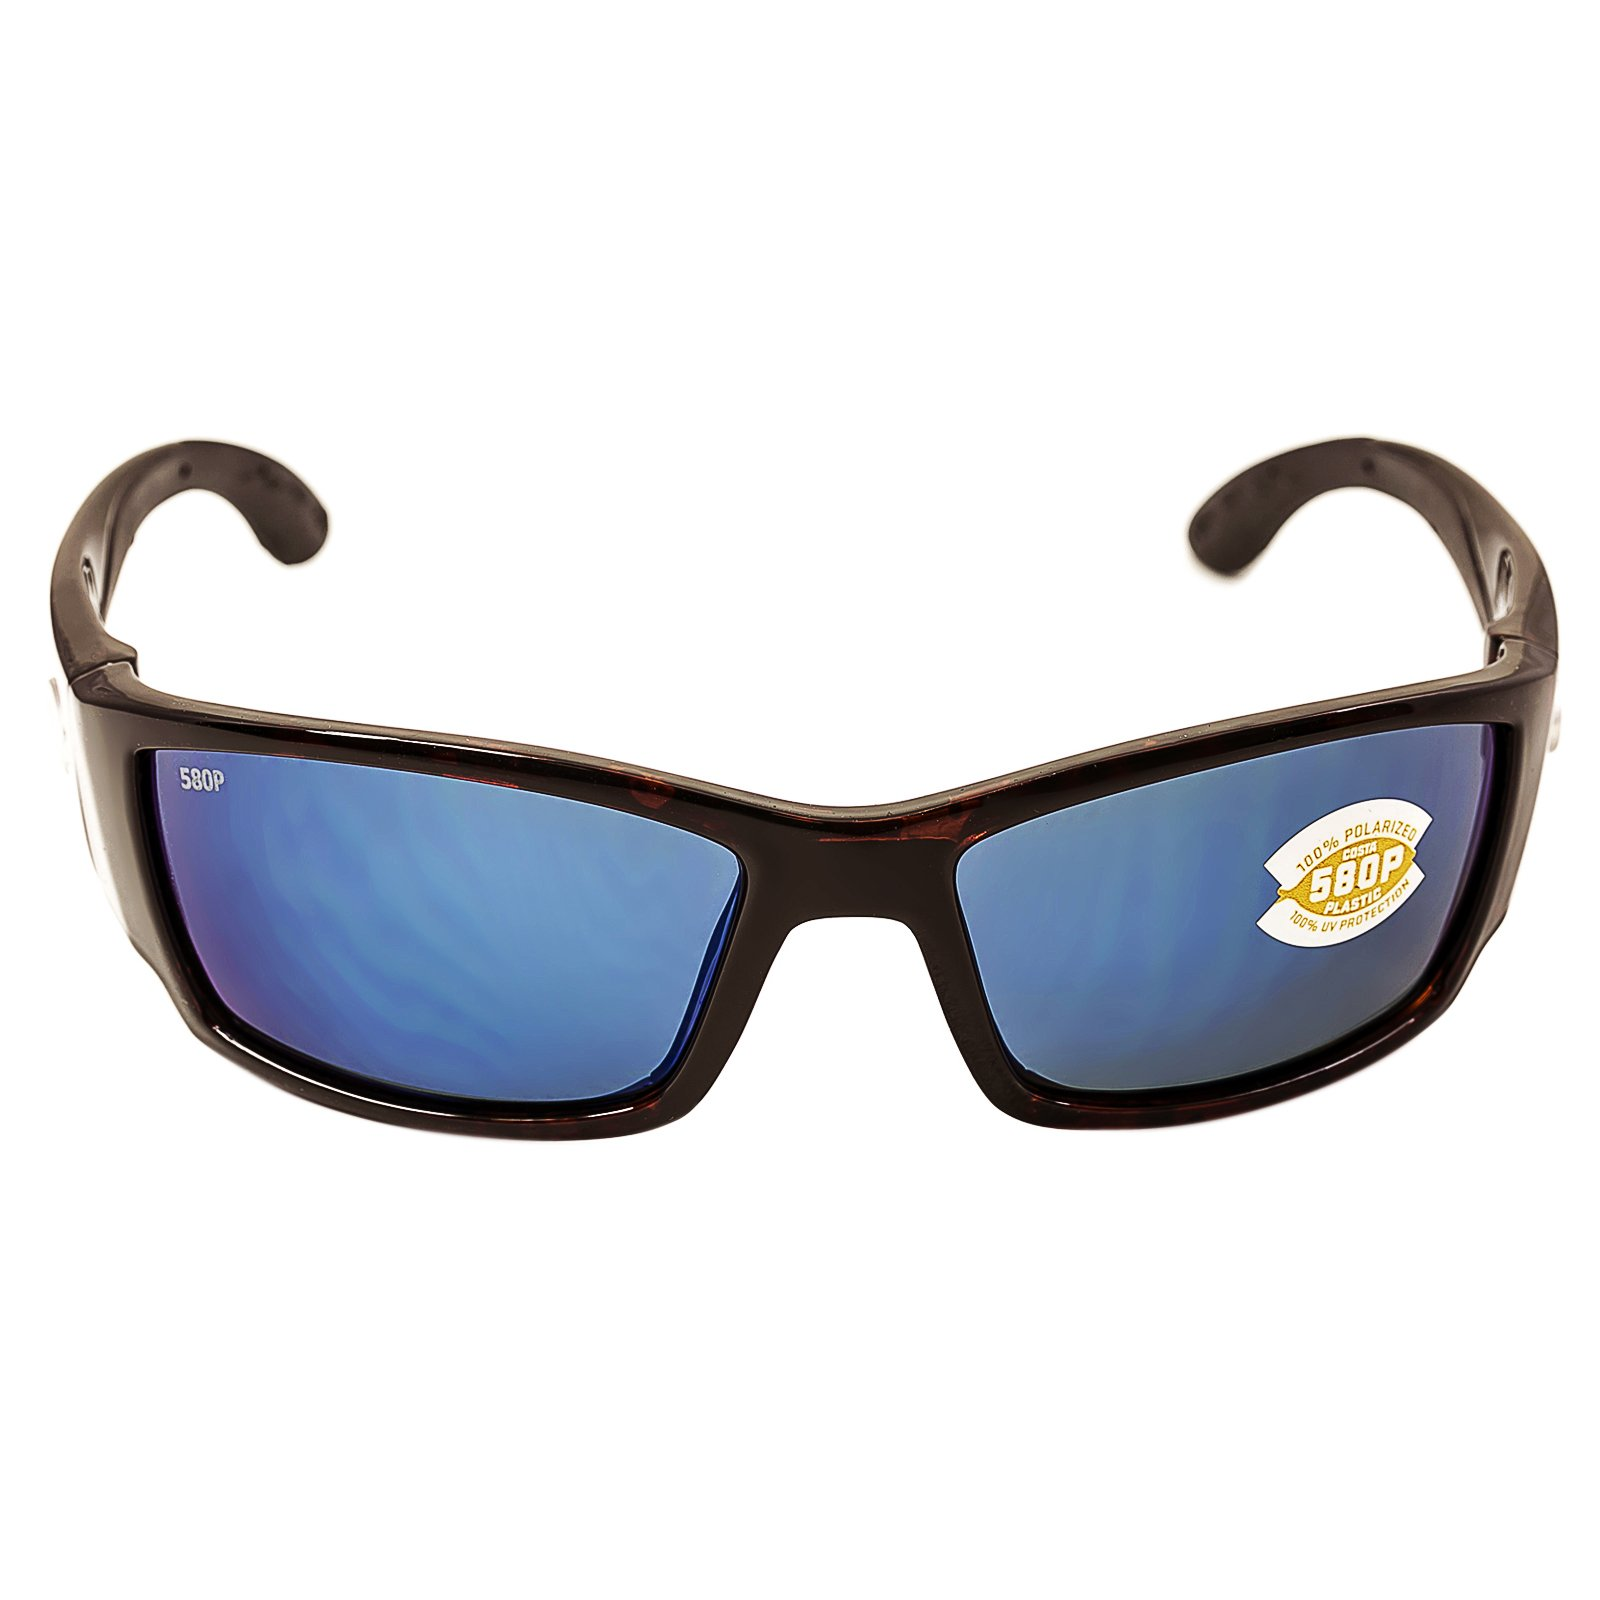 Costa Del Mar Corbina Sunglasses, Tortoise, Blue Mirror 580P Lens